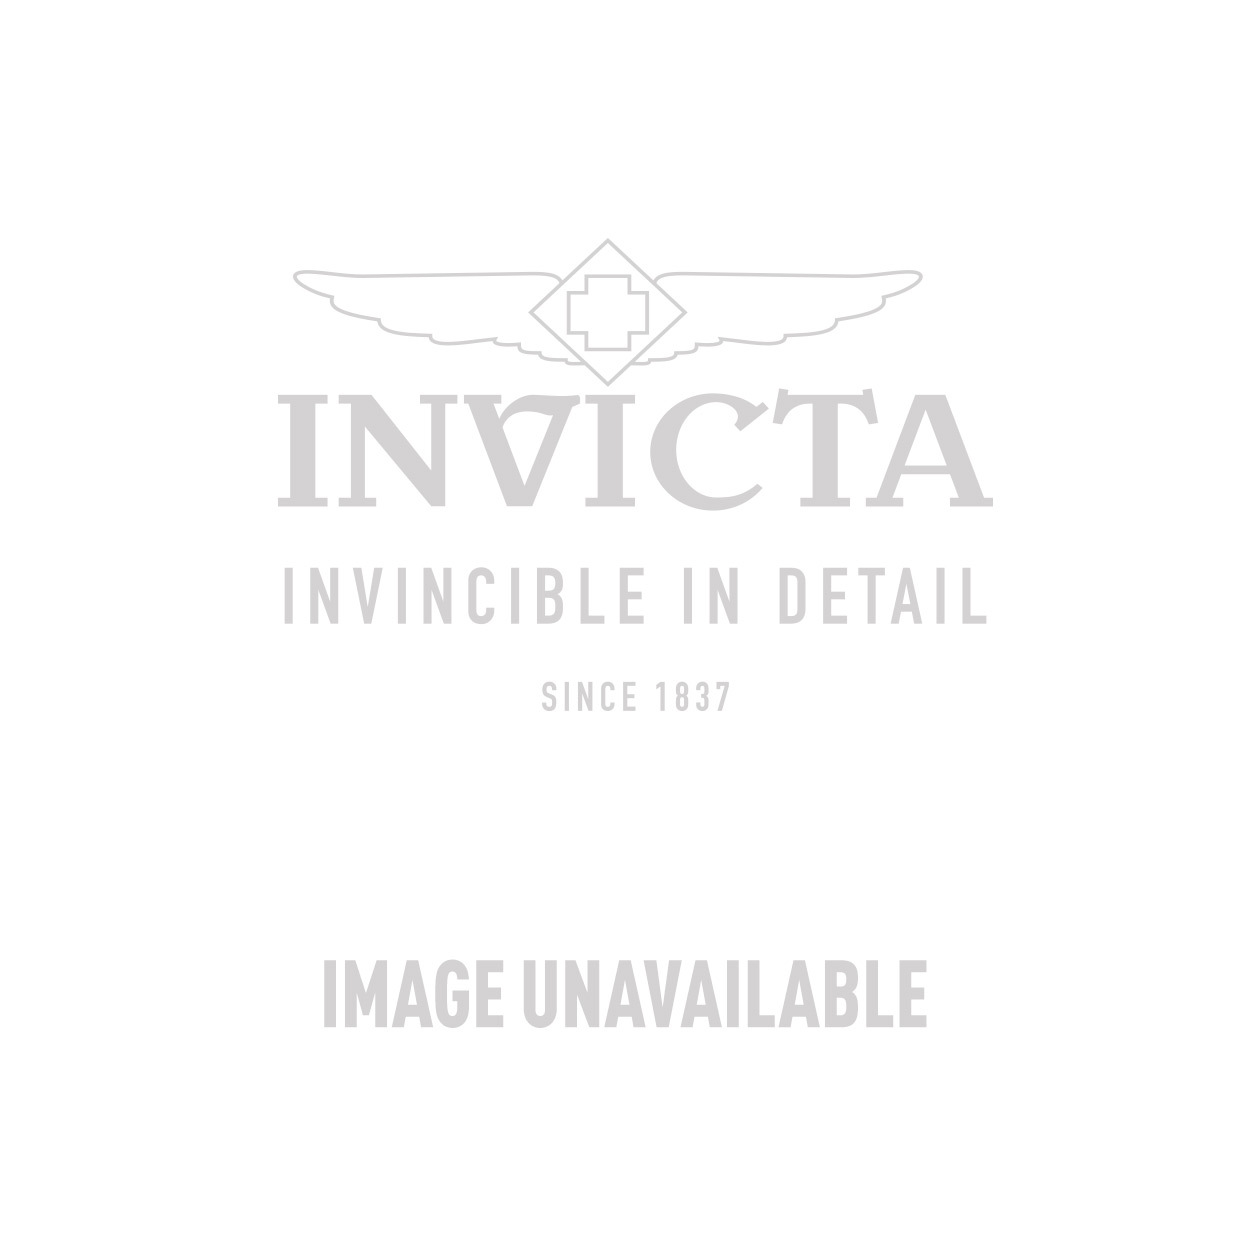 Invicta Corduba  Automatic Watch - Gold, Black case with Black tone Kevlar band - Model 13683